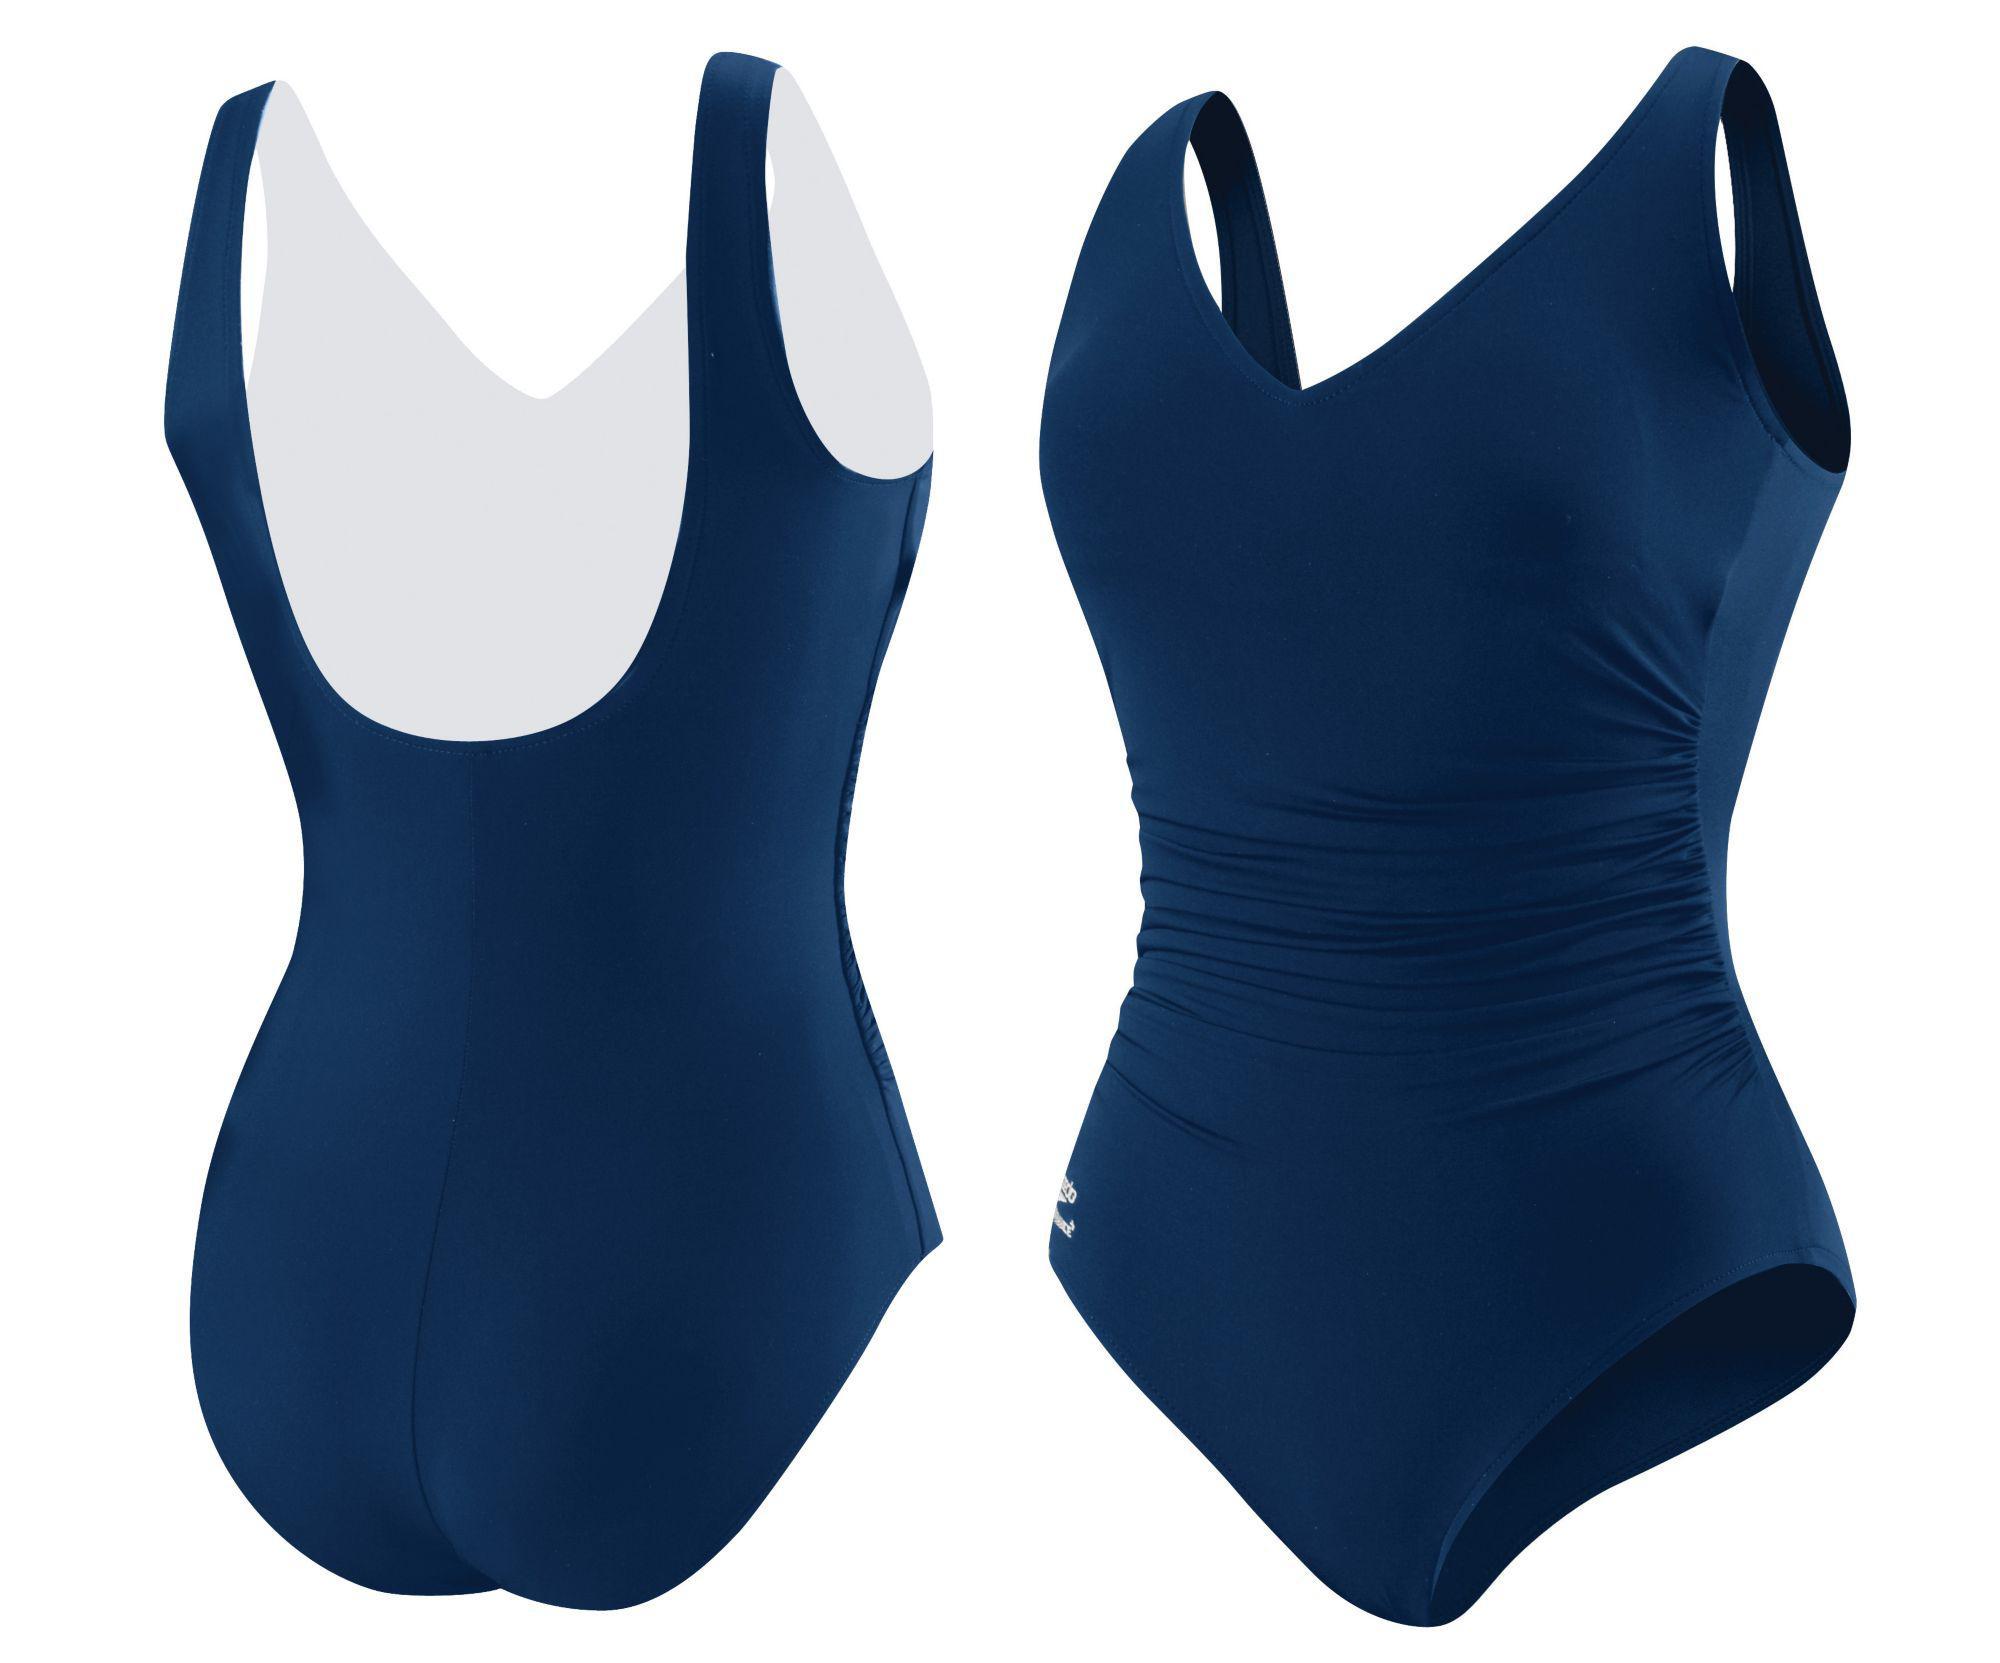 044f3313bfb40 Lyst - Speedo Endurance+ Side Shirred Contourback Swimsuit in Blue